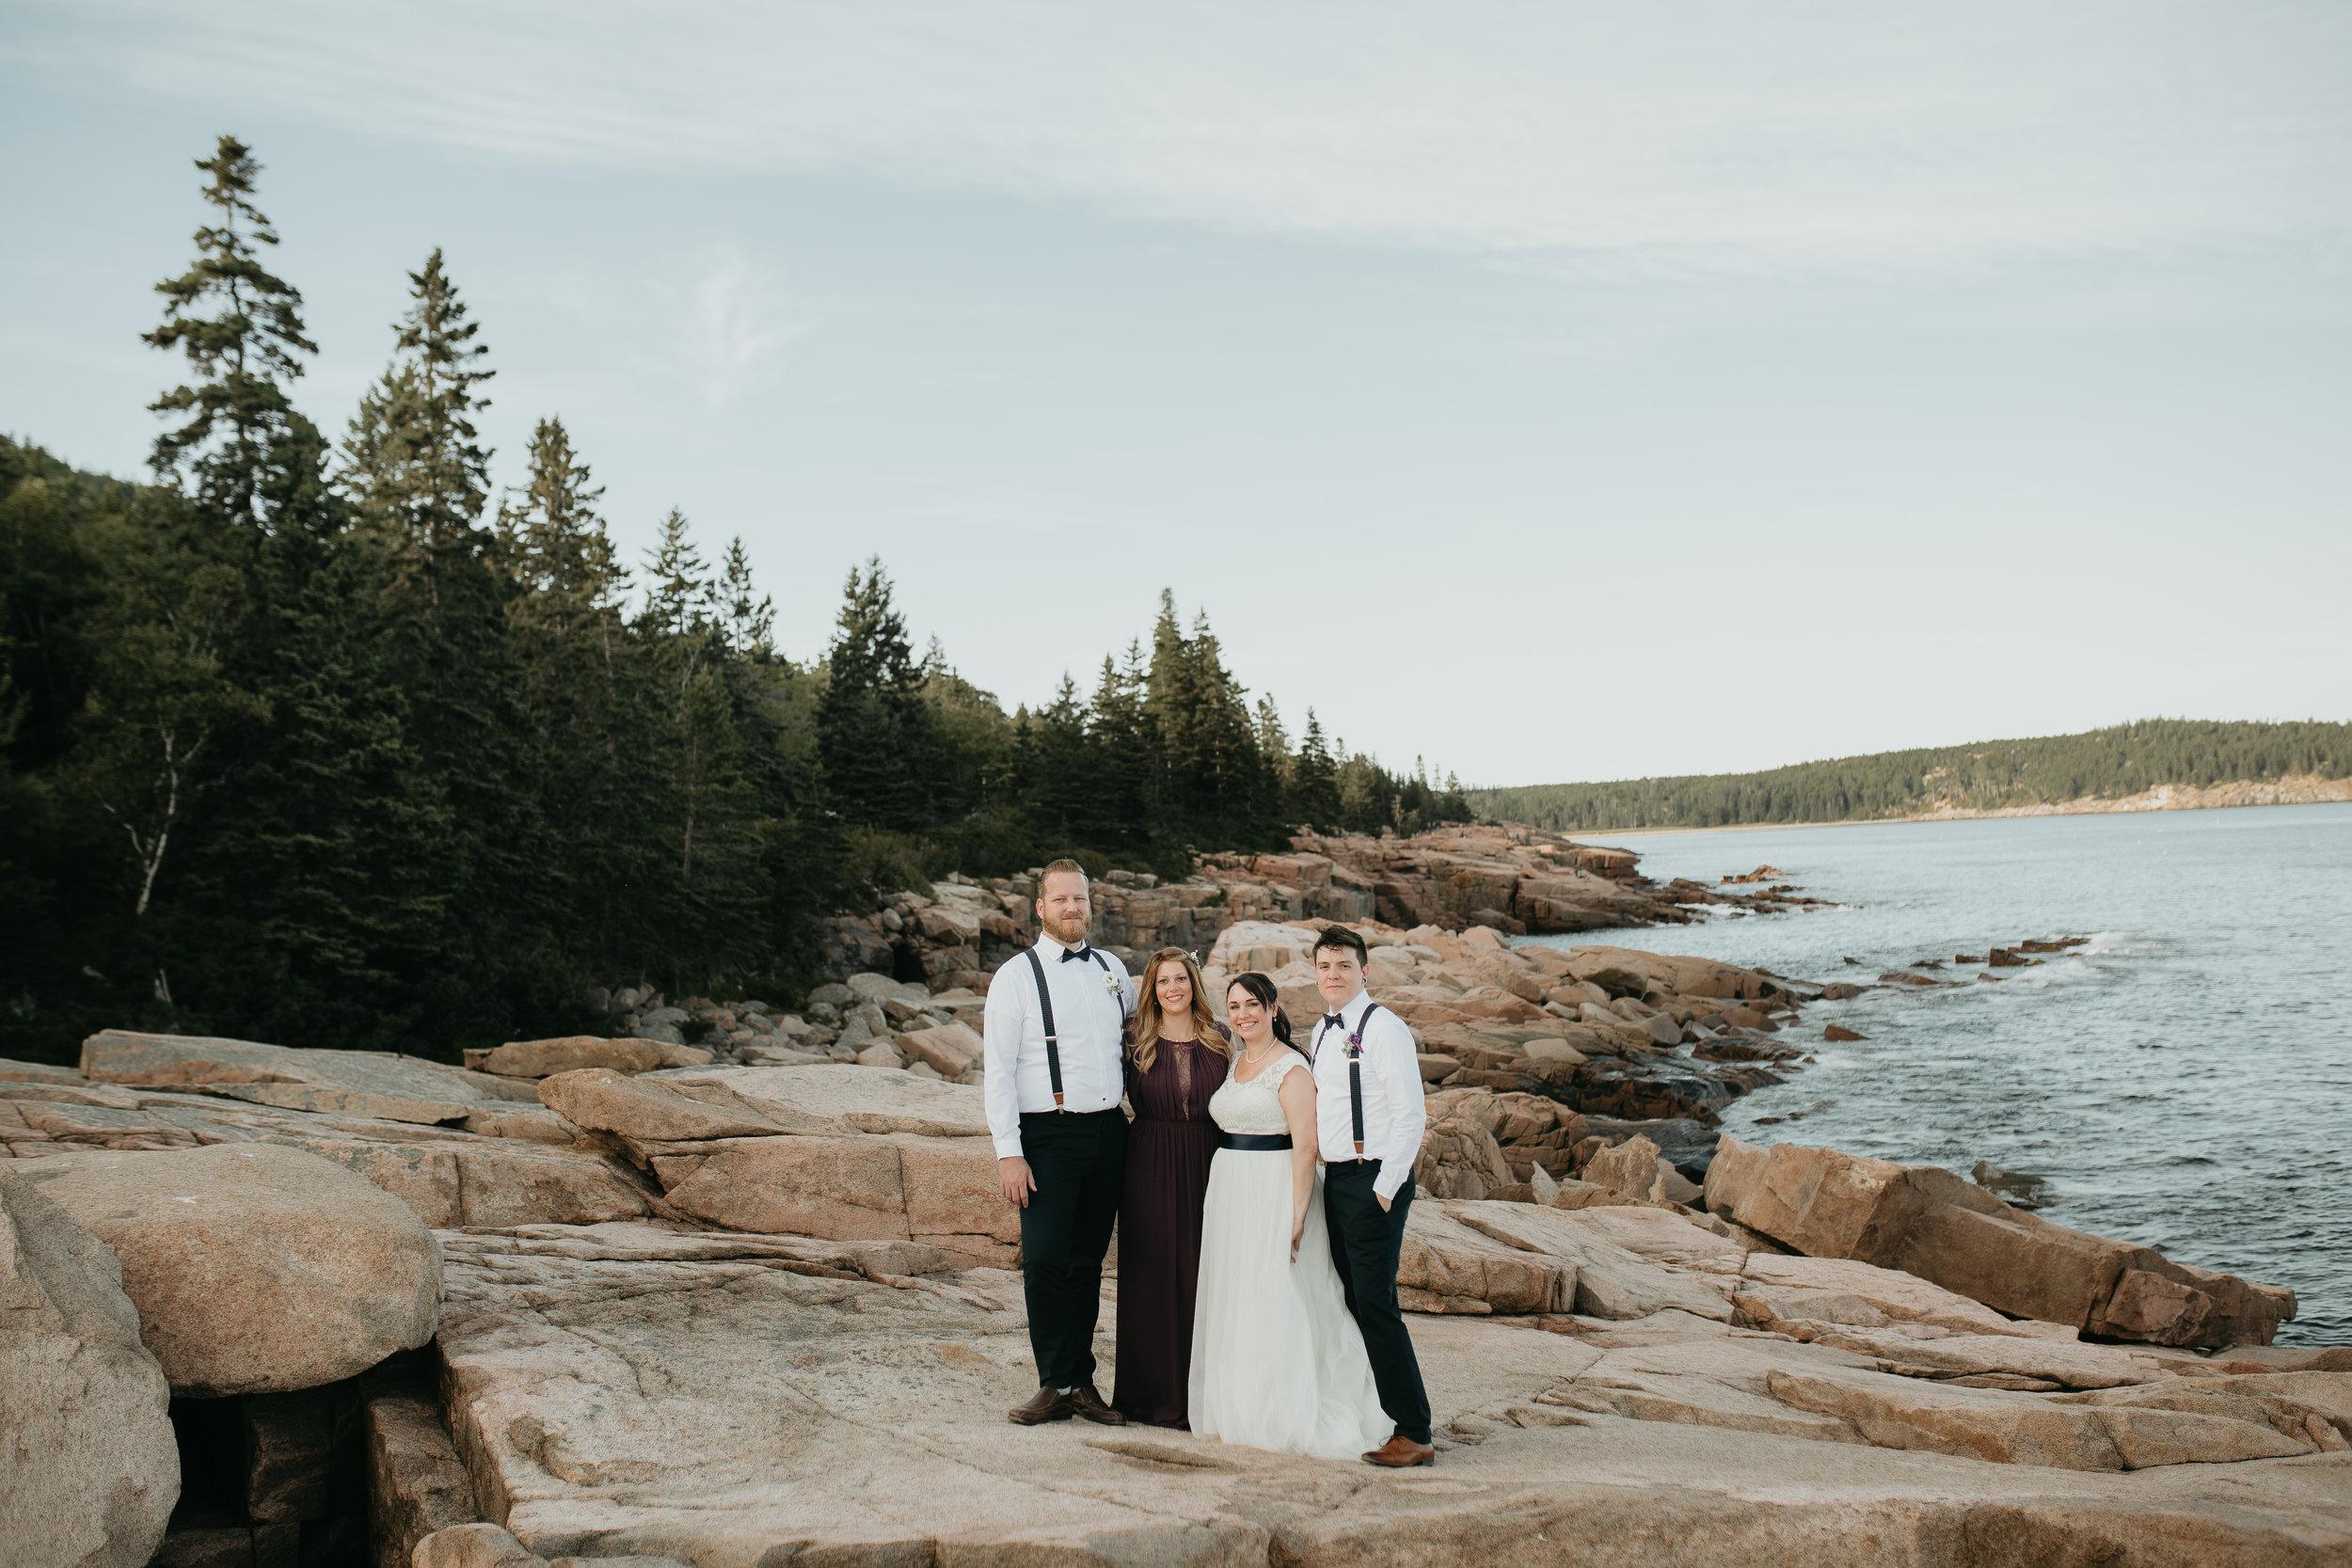 nicole-daacke-photography-Elopement-rocky-shoreline-coast-Acadia-National-Park-elopement-photographer-inspiration-maine-elopement-otter-cliffs-schoonic-head-point-50.jpg